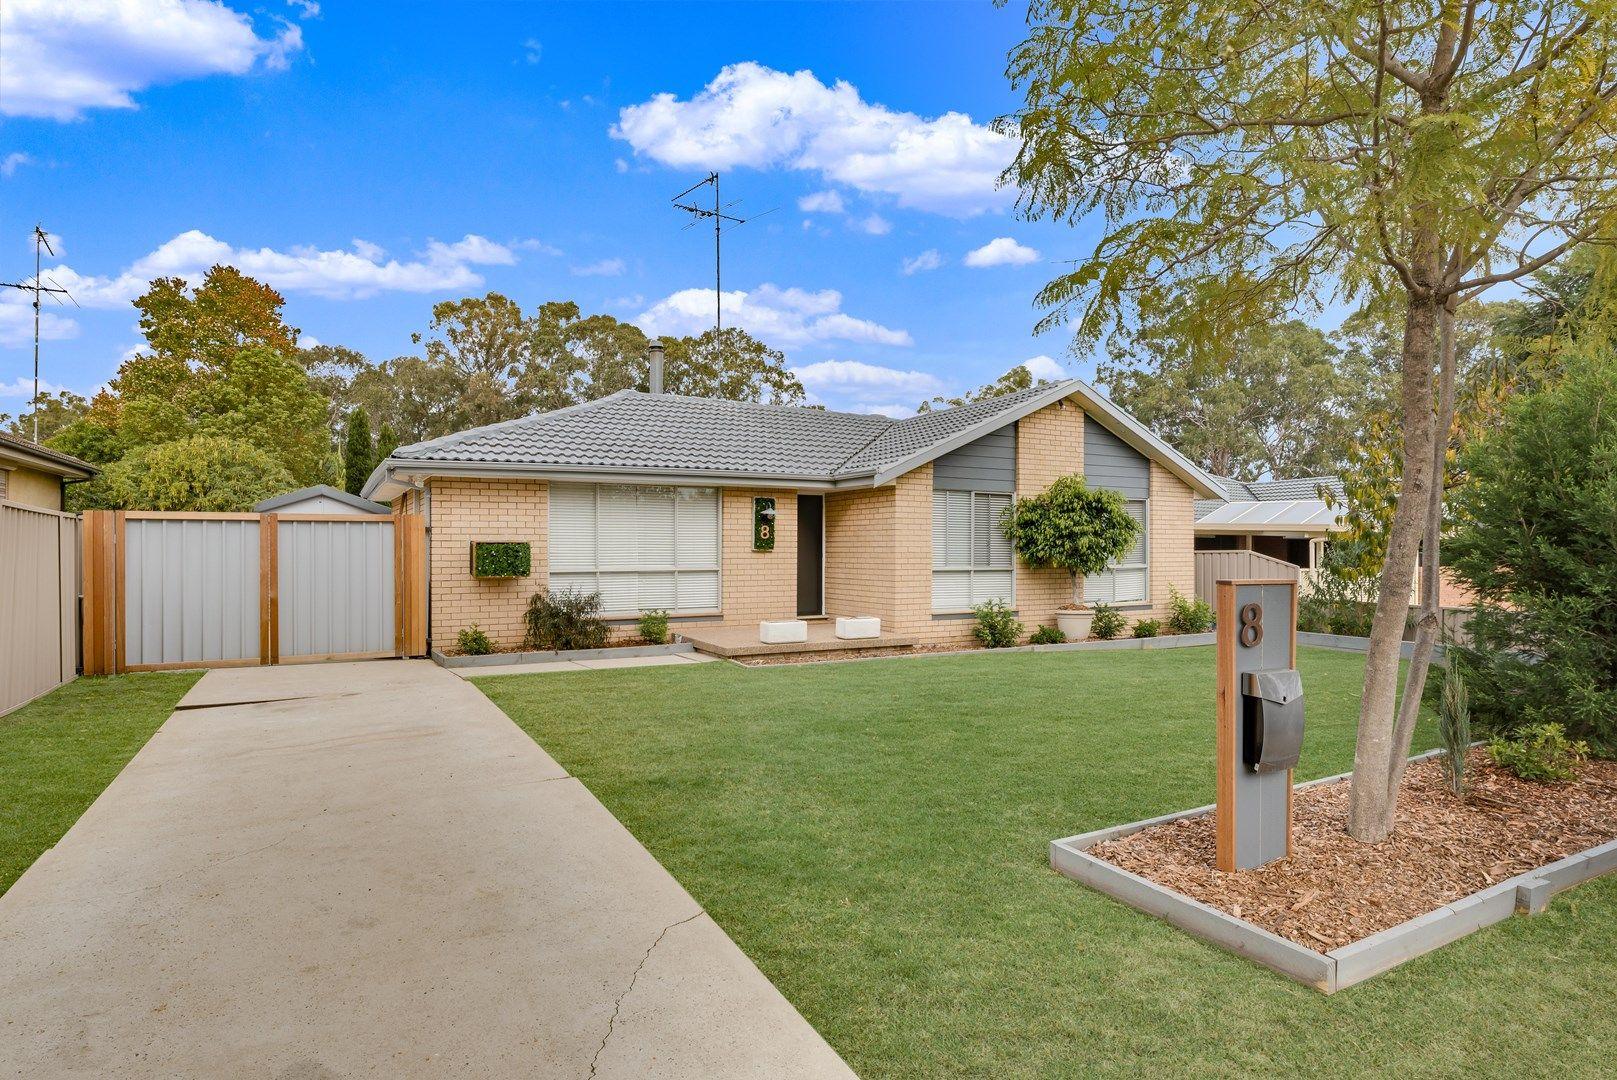 8 Mynah Close, St Clair NSW 2759, Image 0